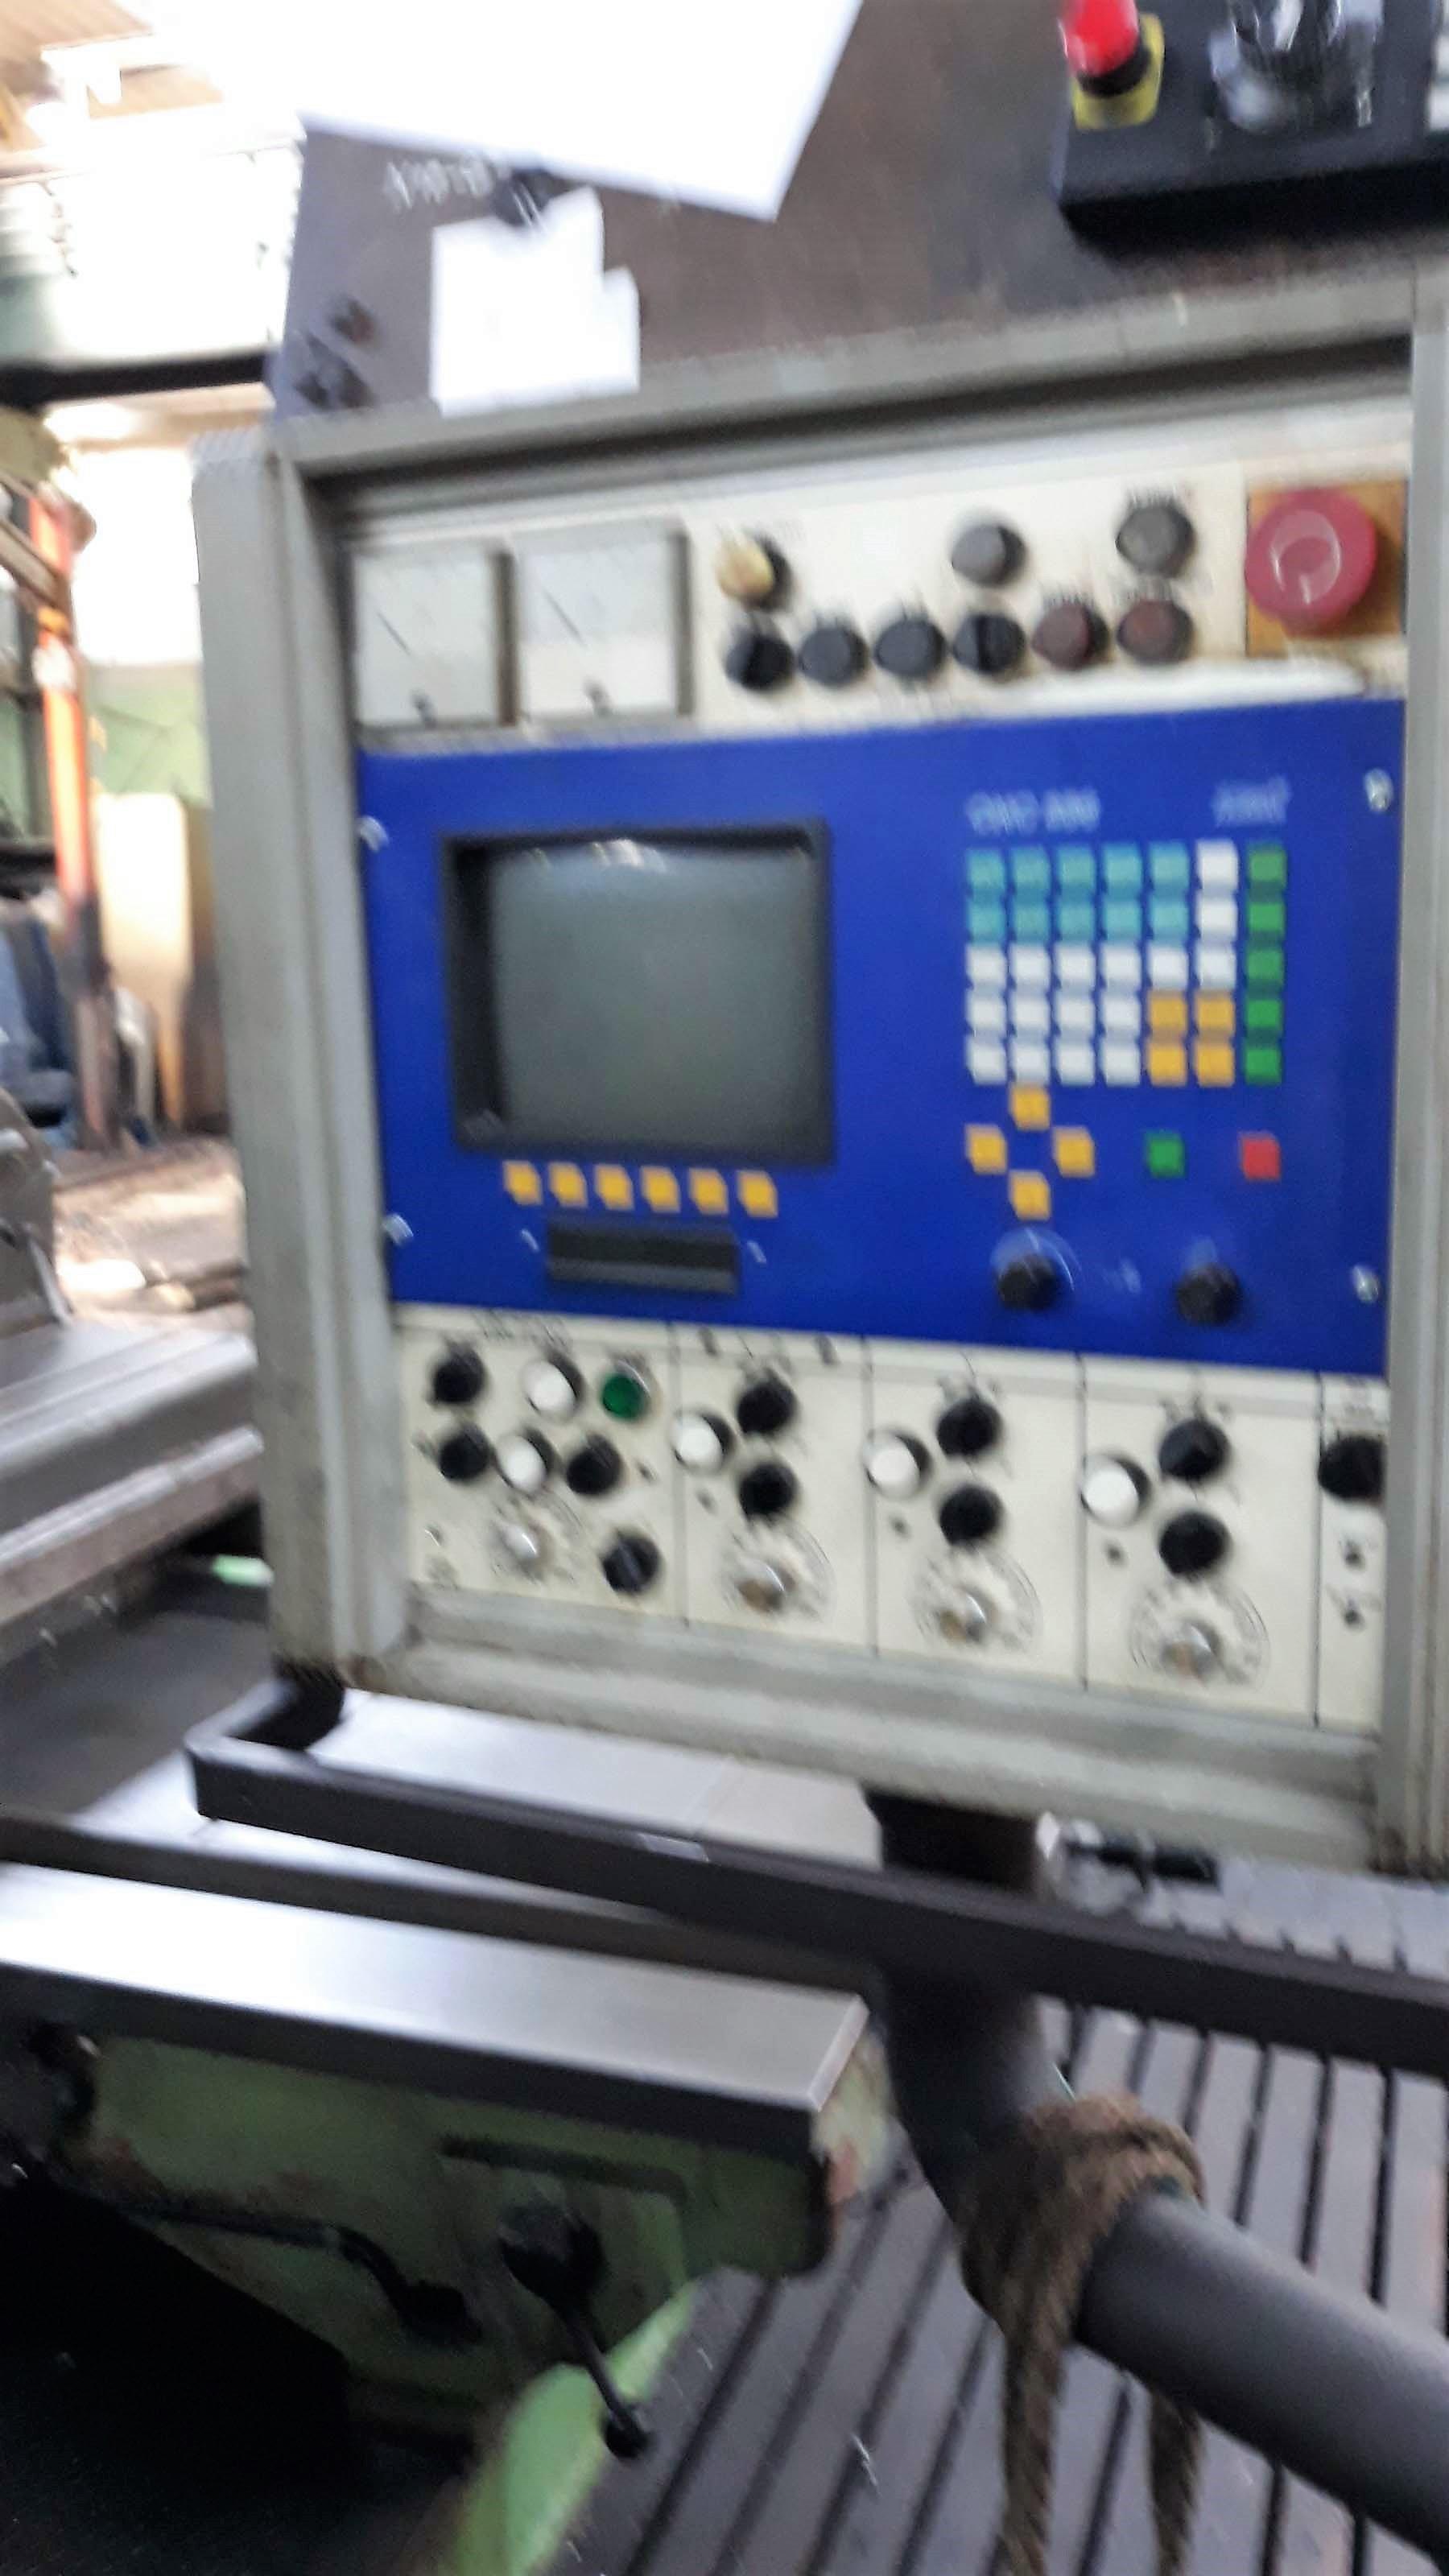 5243-W100A CNC ISO50.03